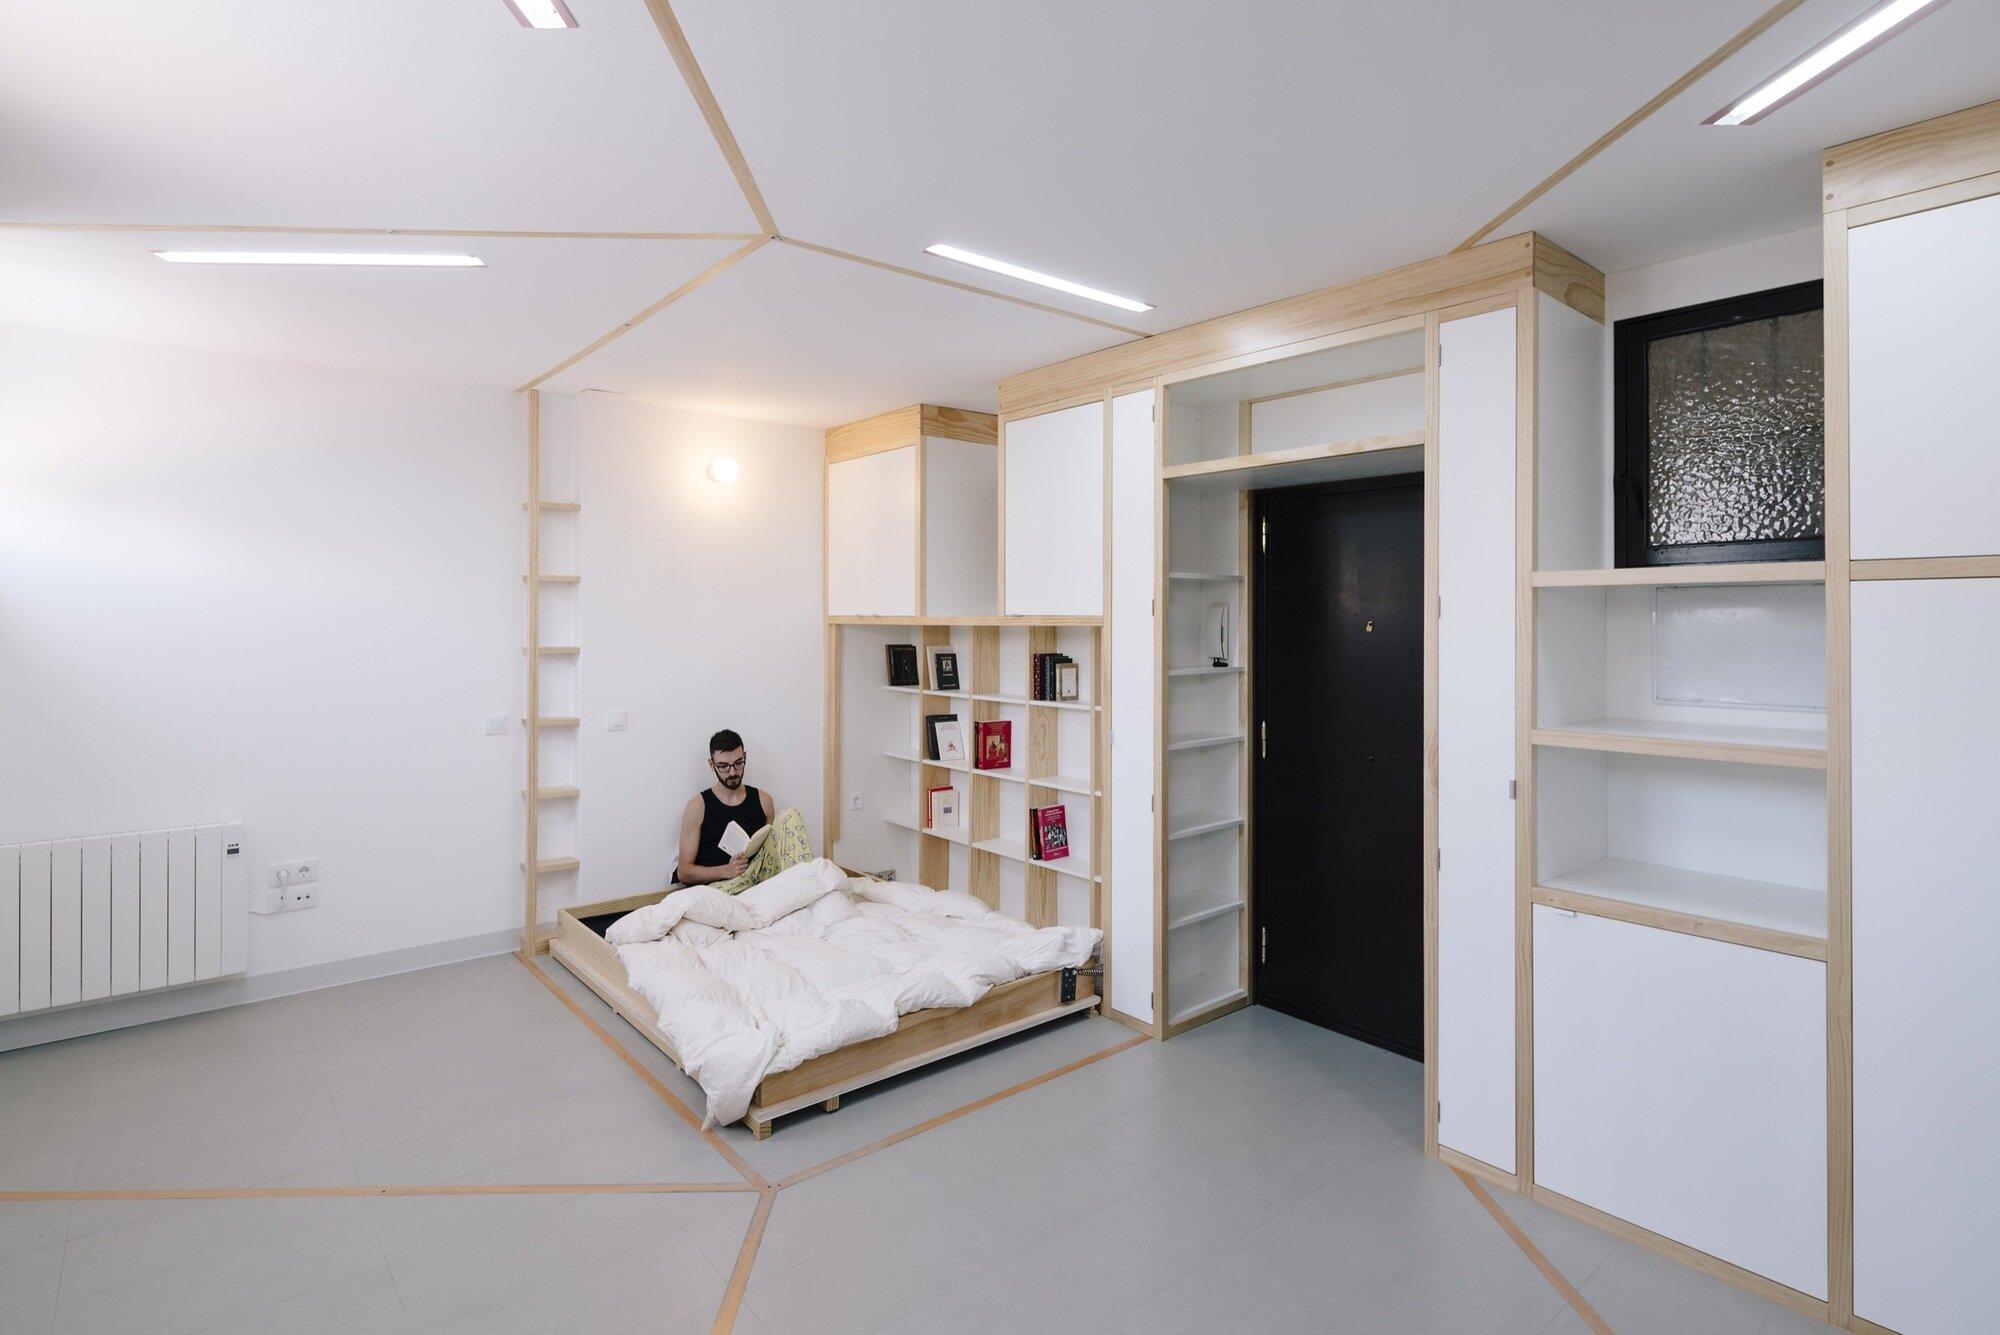 Biombombastic - elii - Spain - Fold-down Bed - Humble Homes